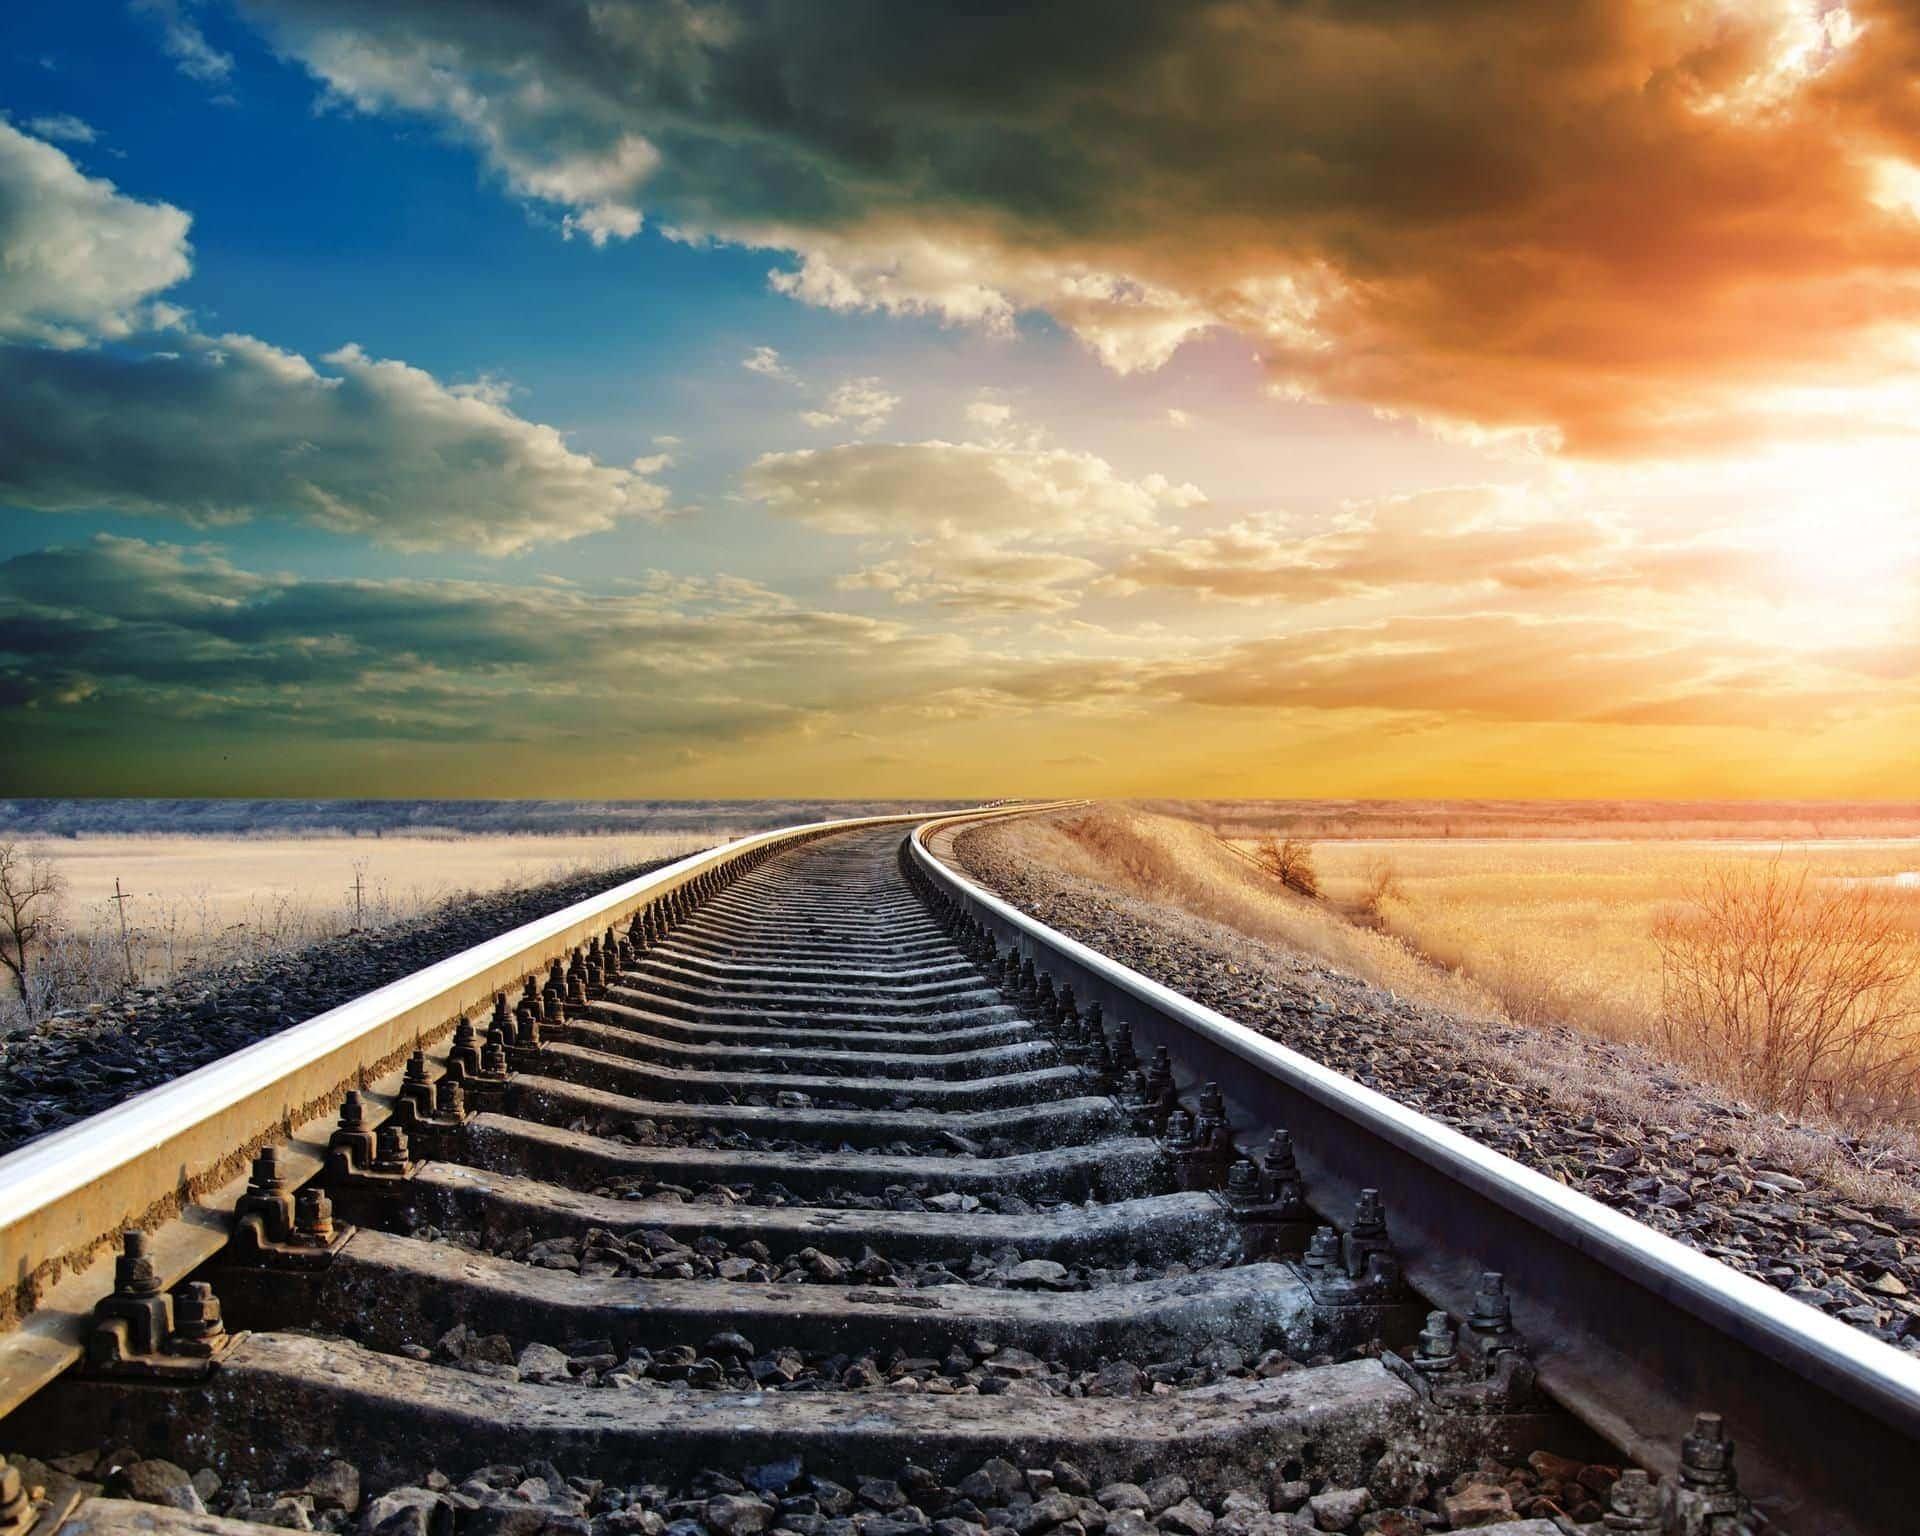 railway dream meaning, dream about railway, railway dream interpretation, seeing in a dream railway